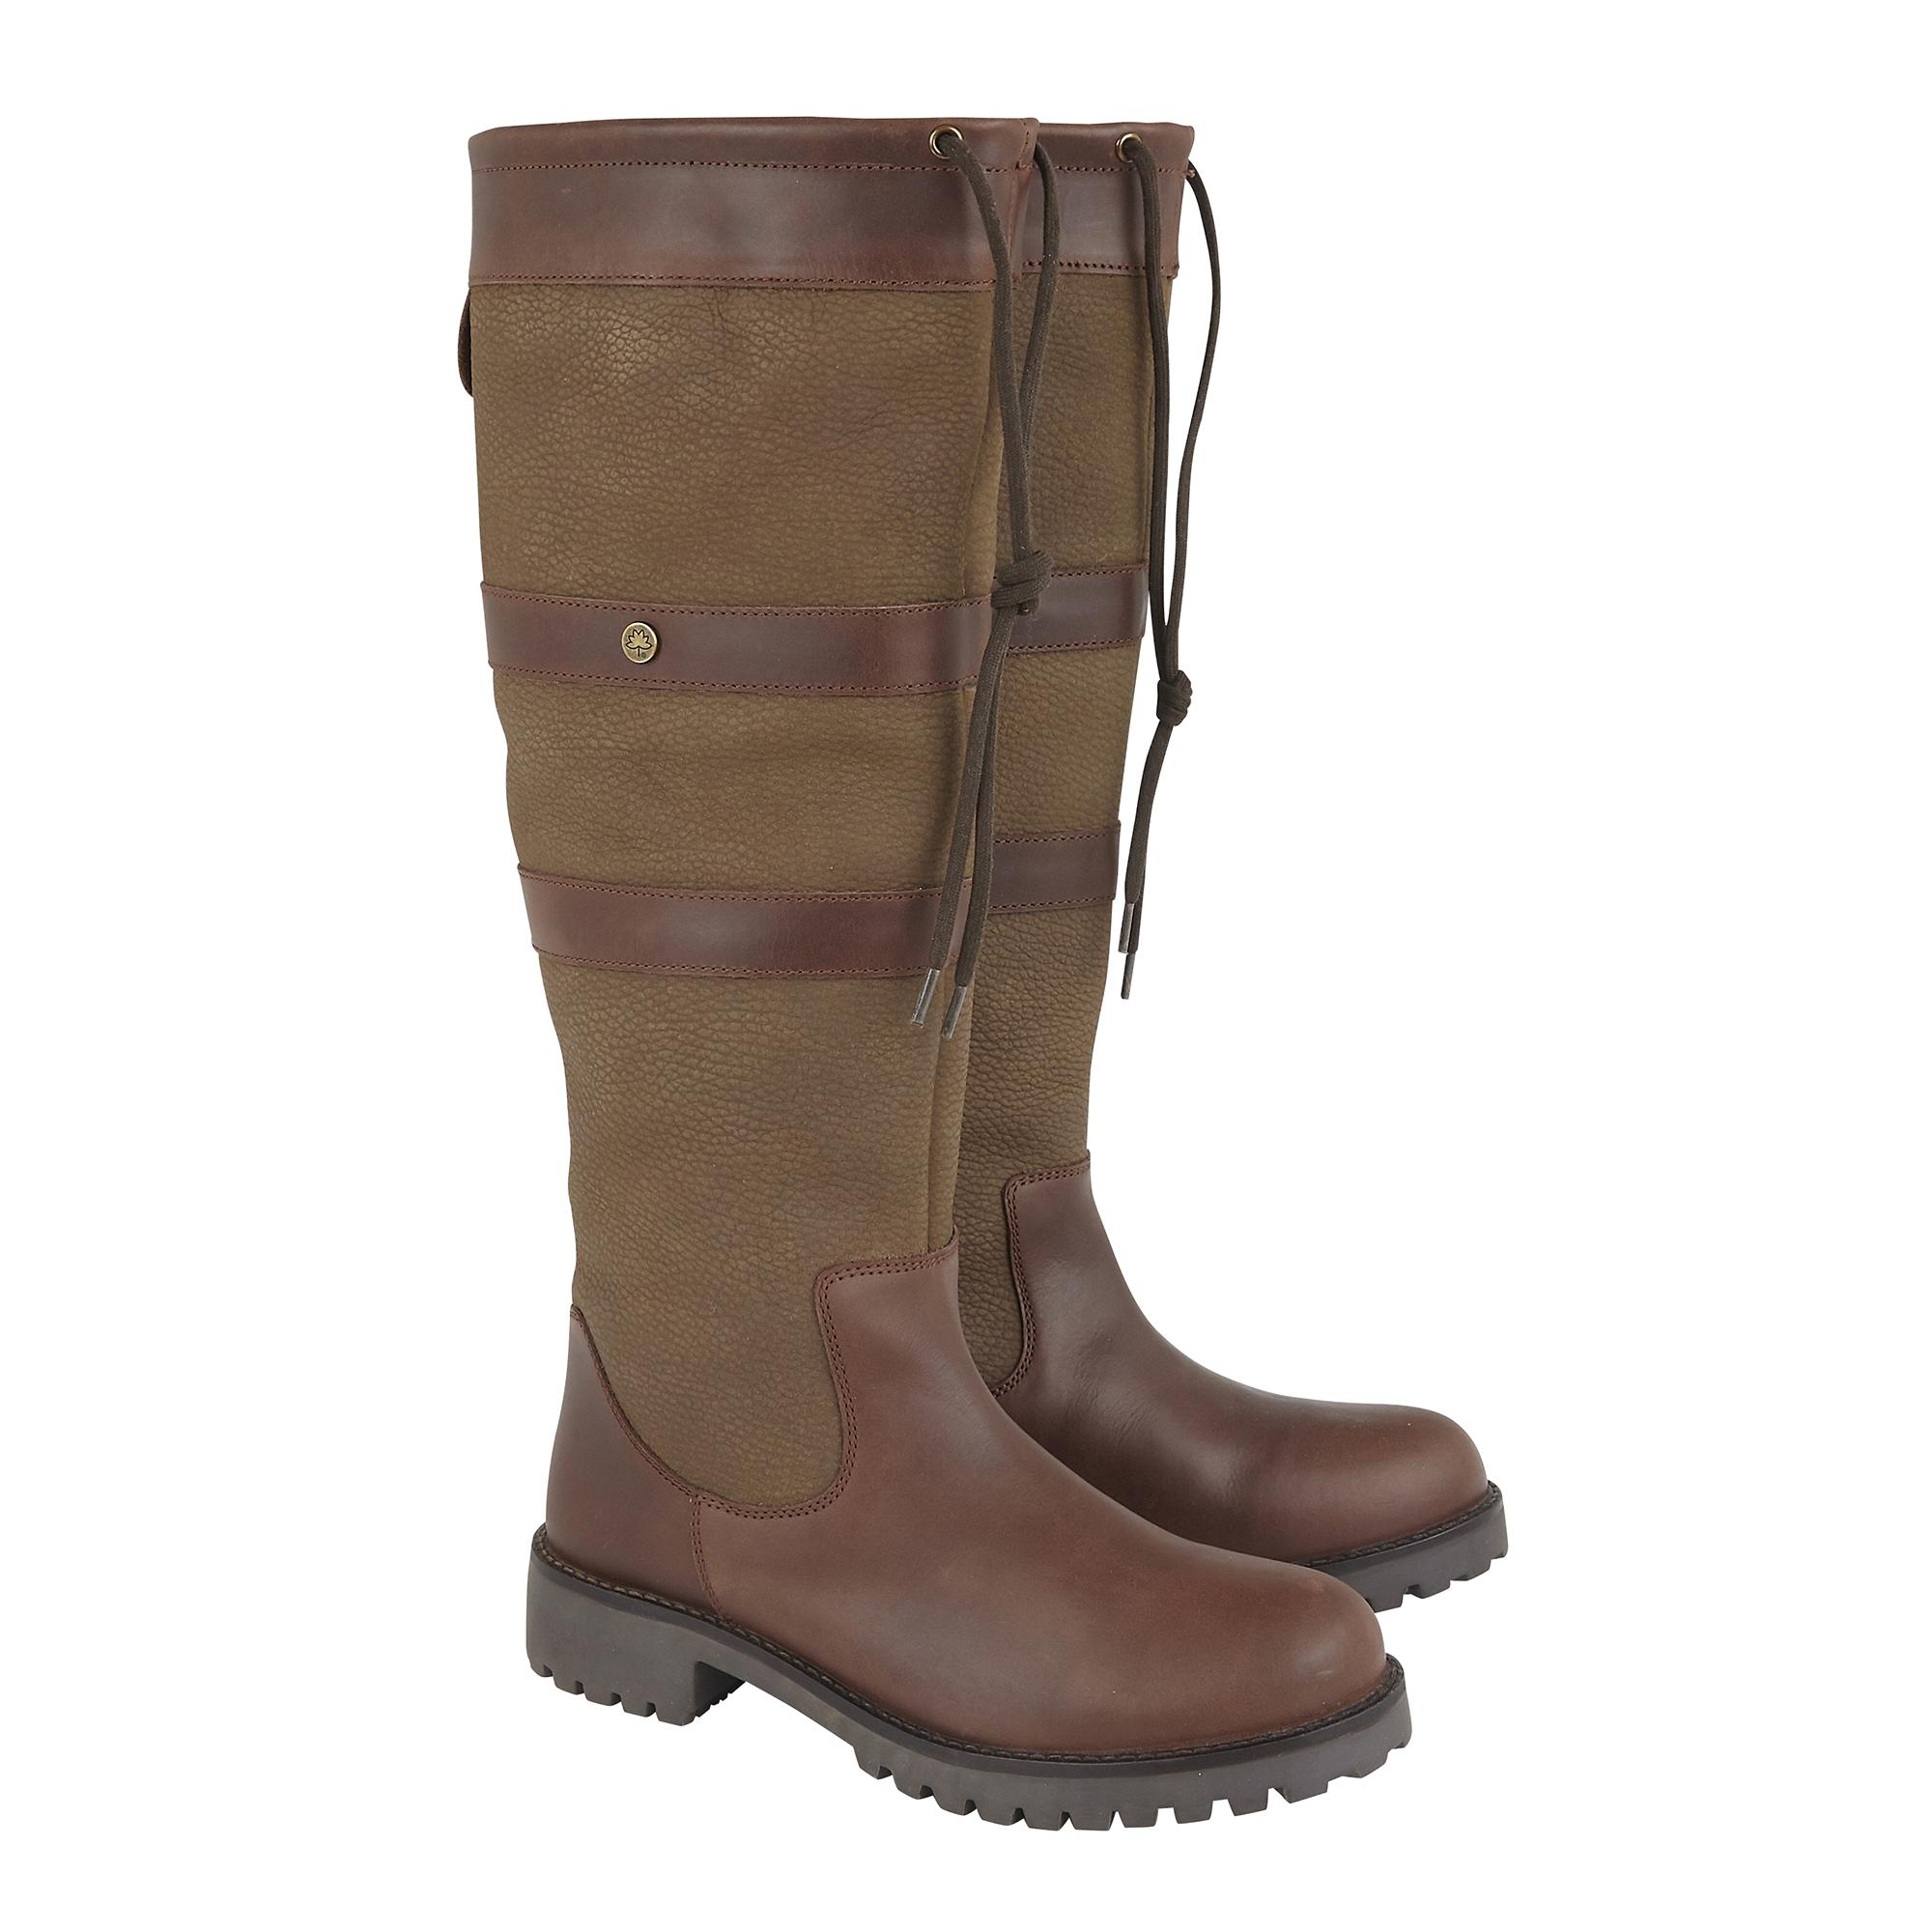 Banbury country boot